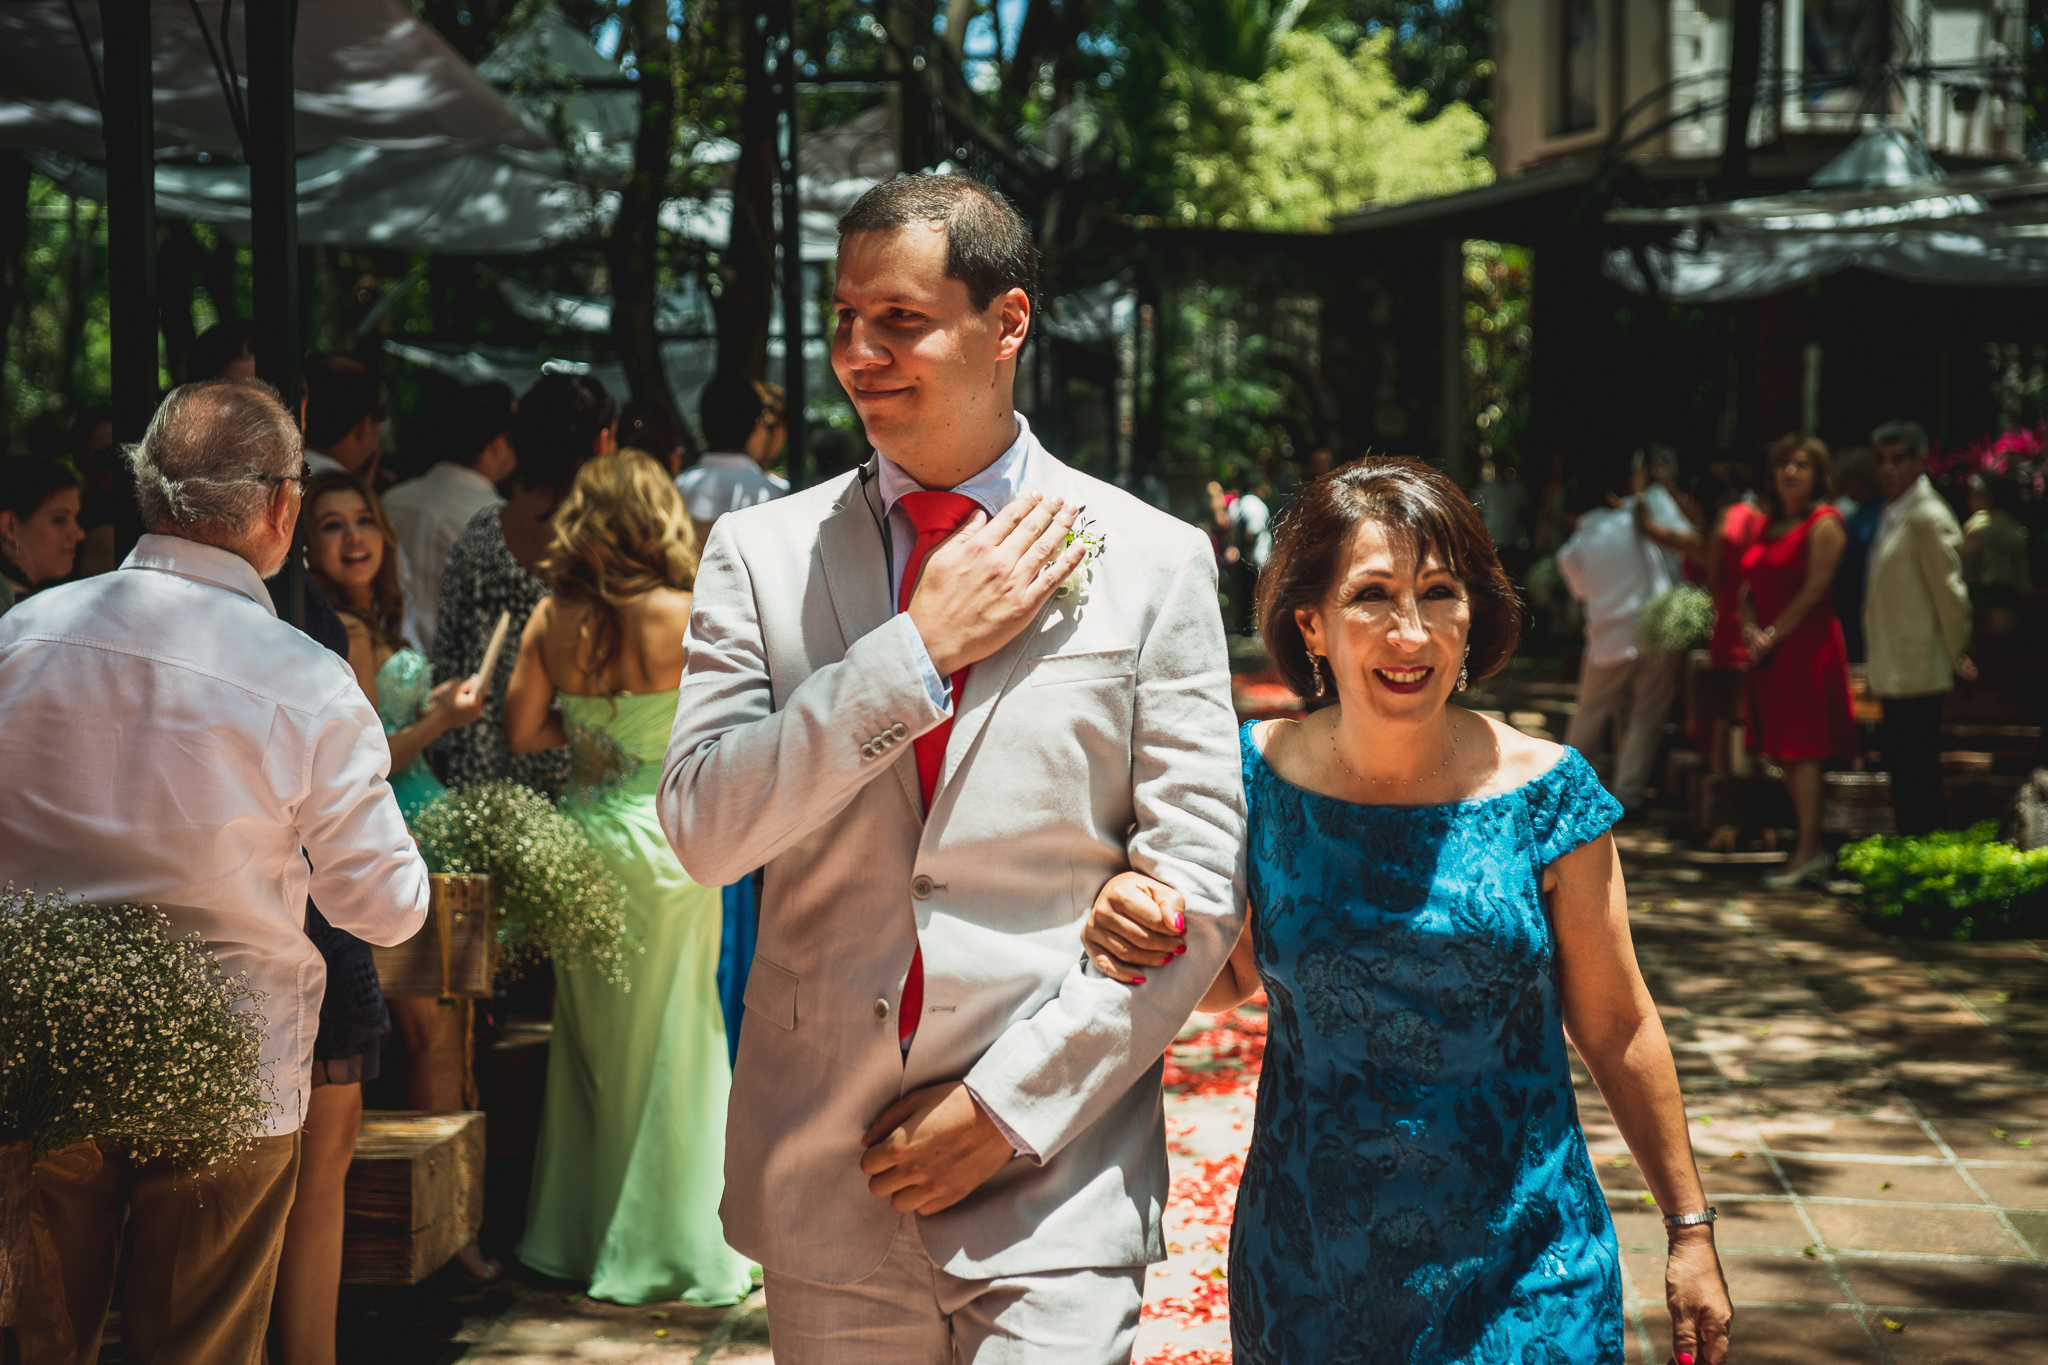 wedding-photography-mexico-quinta-rubelinas-31.jpg